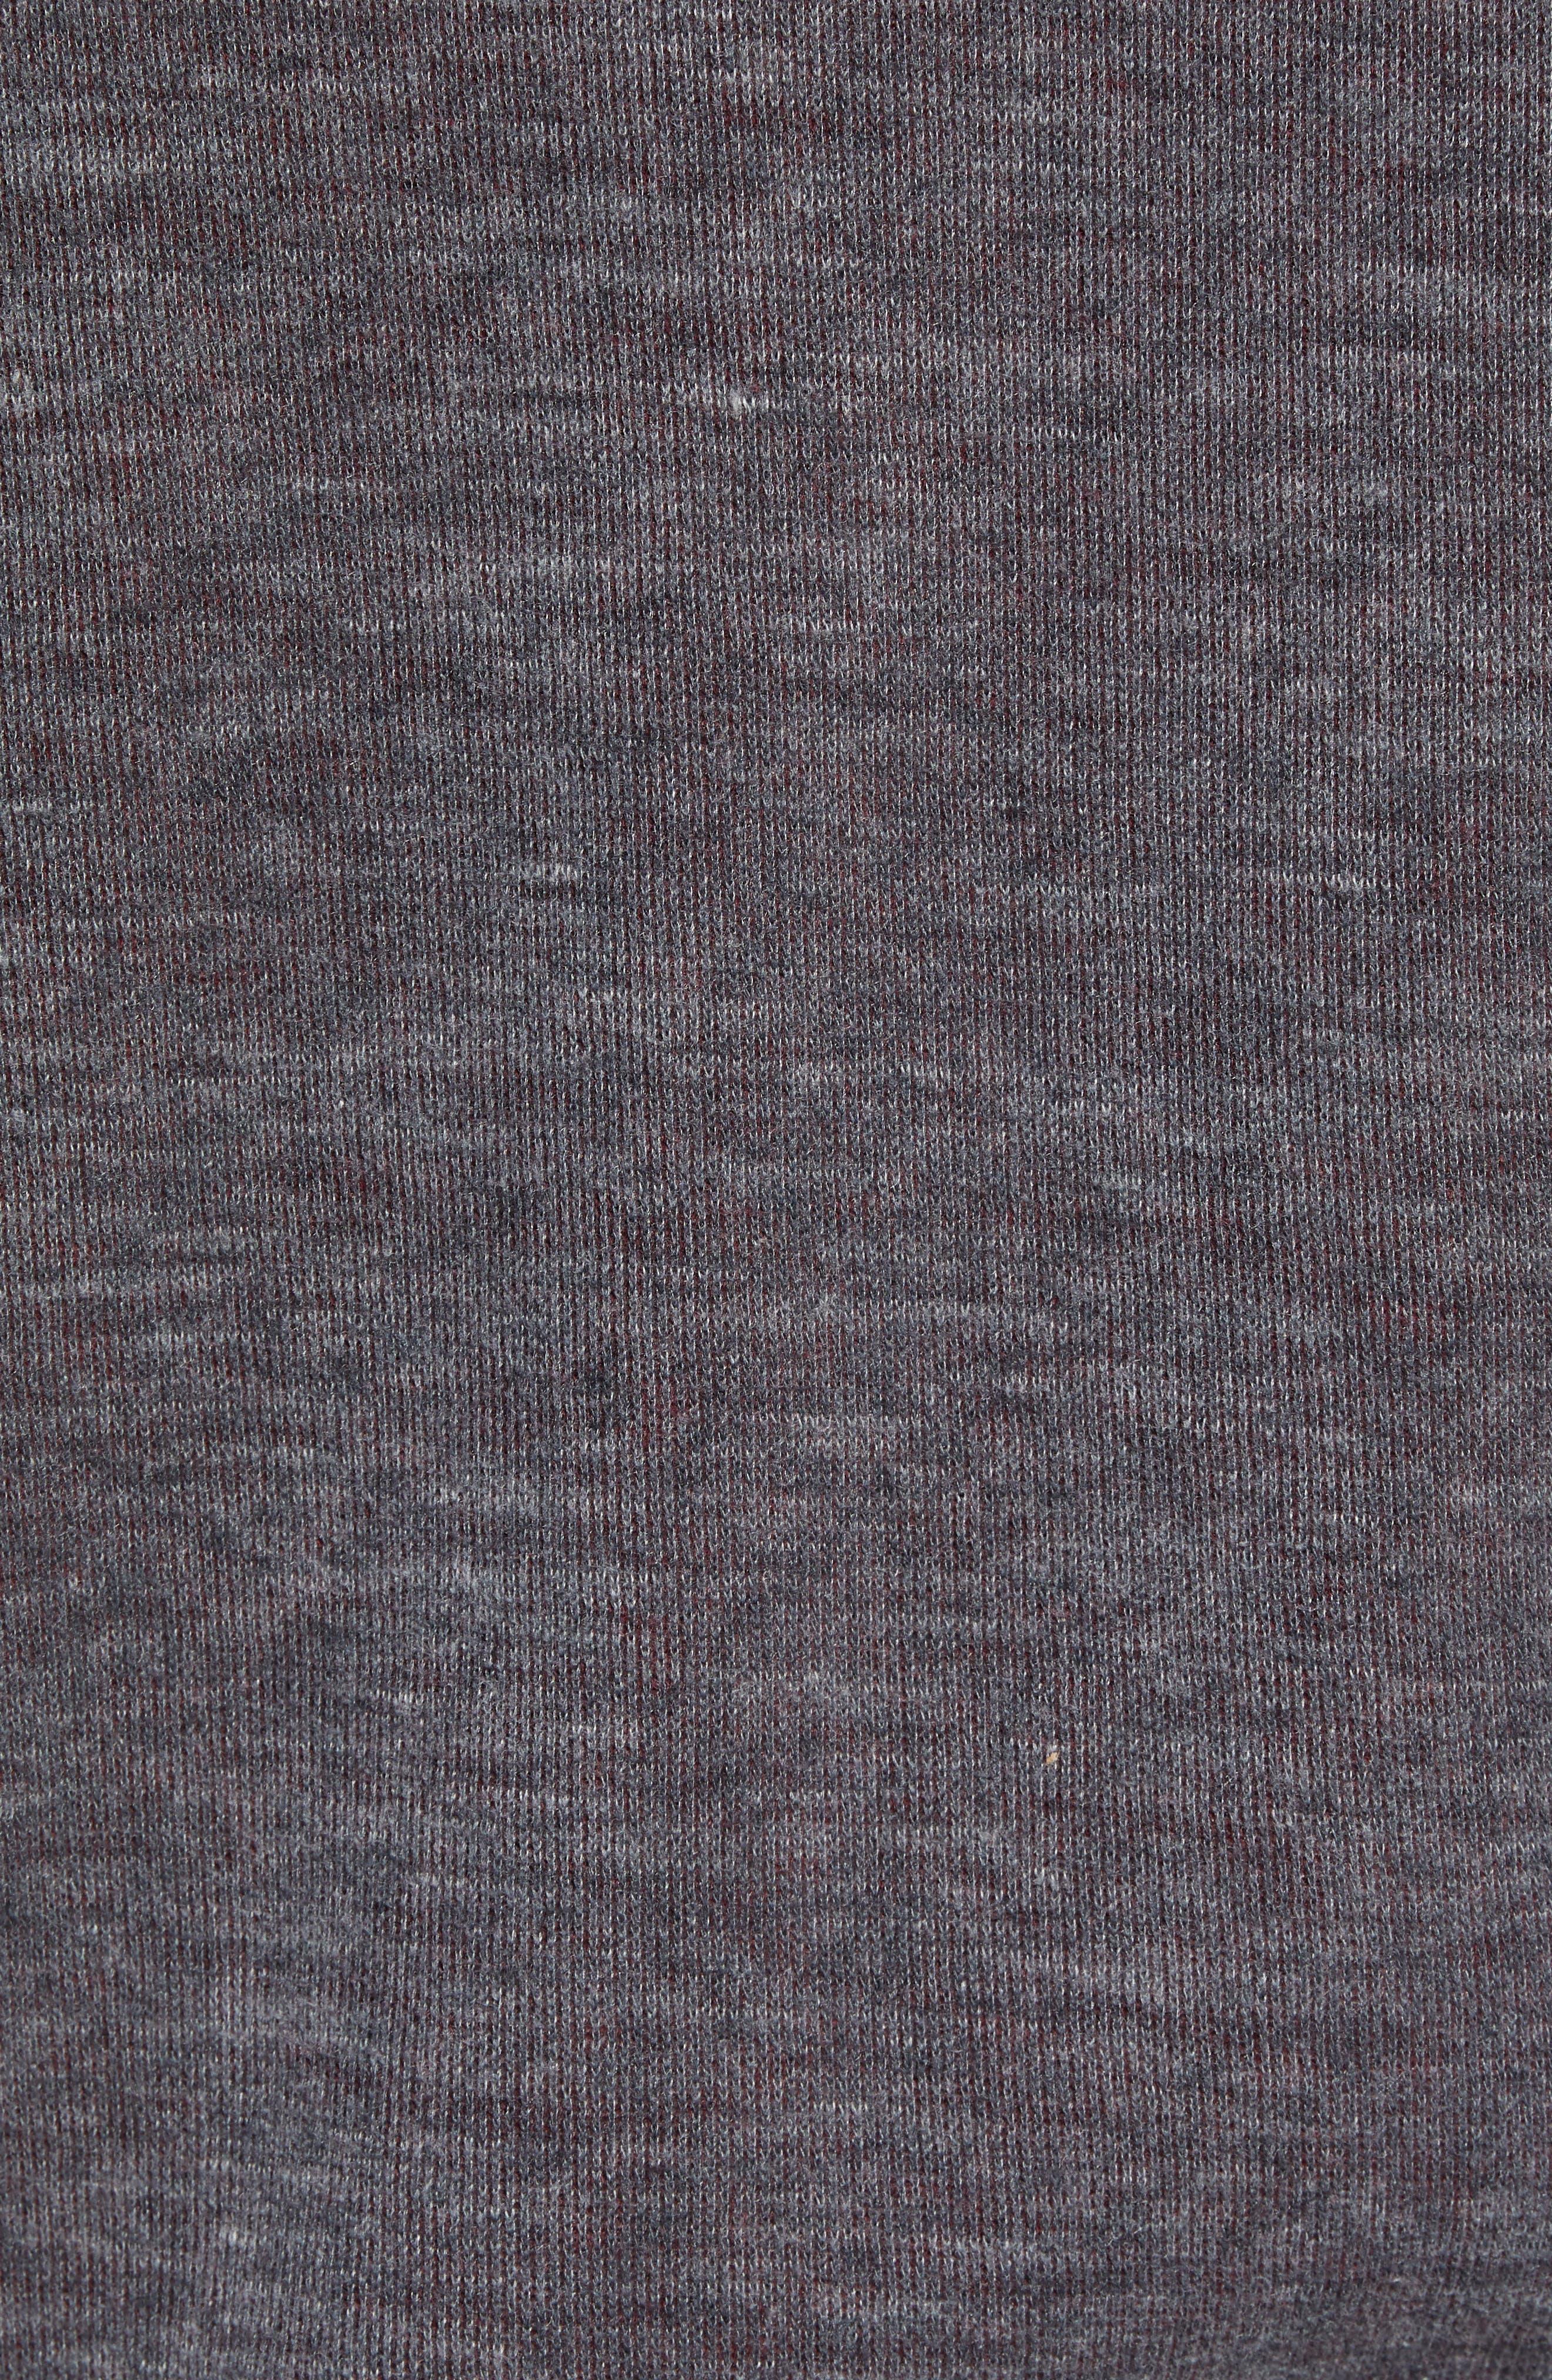 Flip Reversible Zip Hoodie,                             Alternate thumbnail 6, color,                             CHARCOAL HEATHER